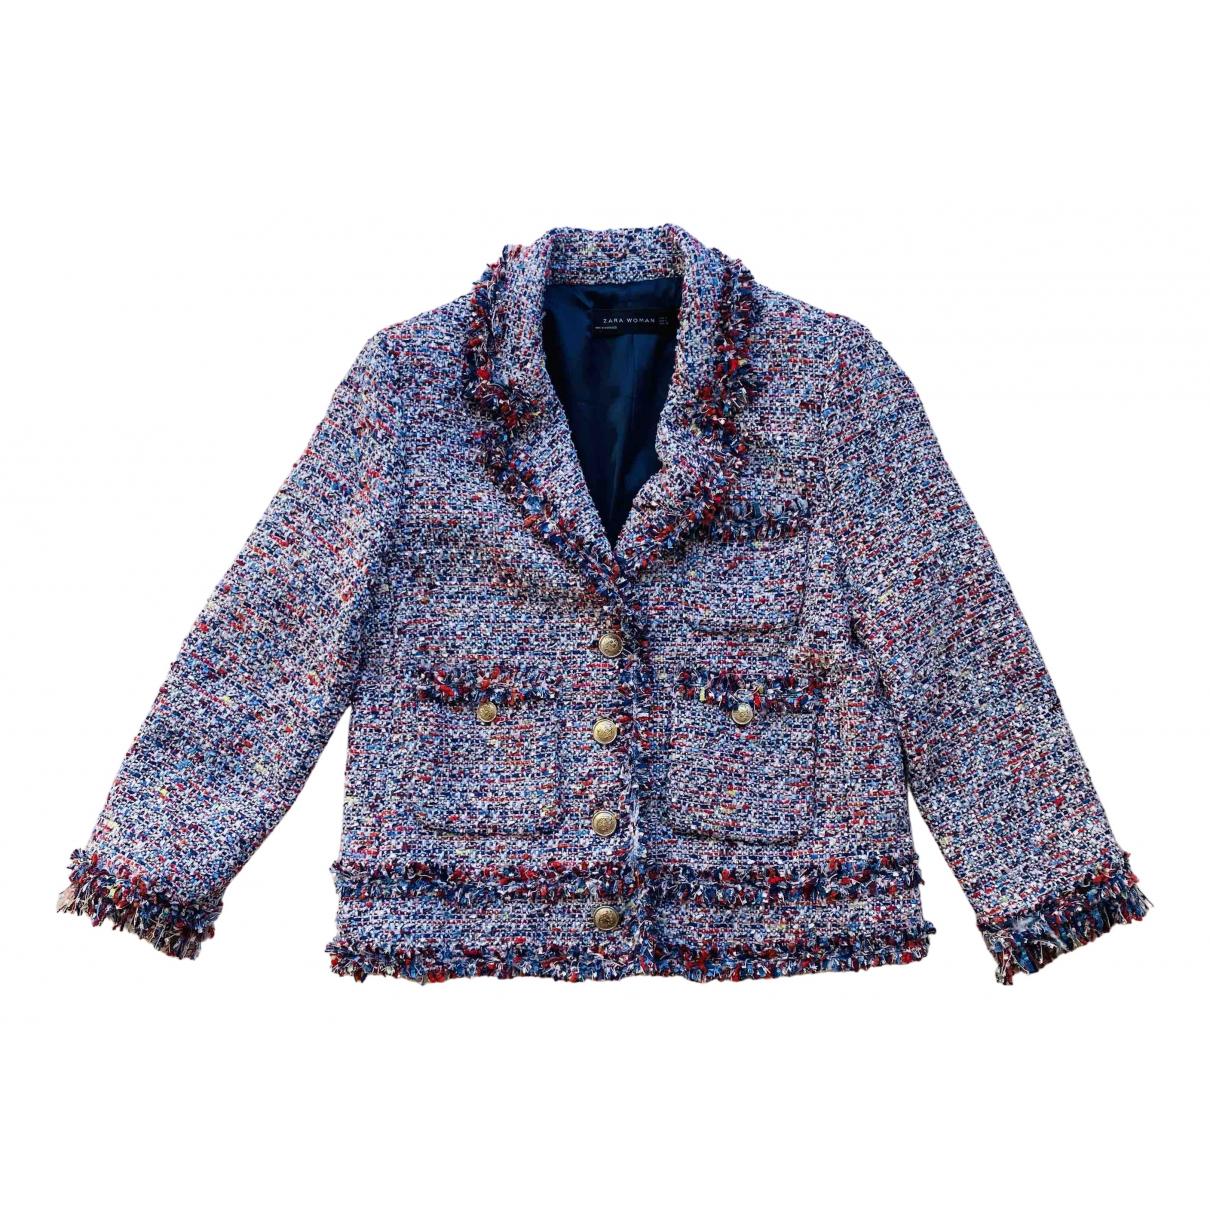 Zara - Veste   pour femme - multicolore